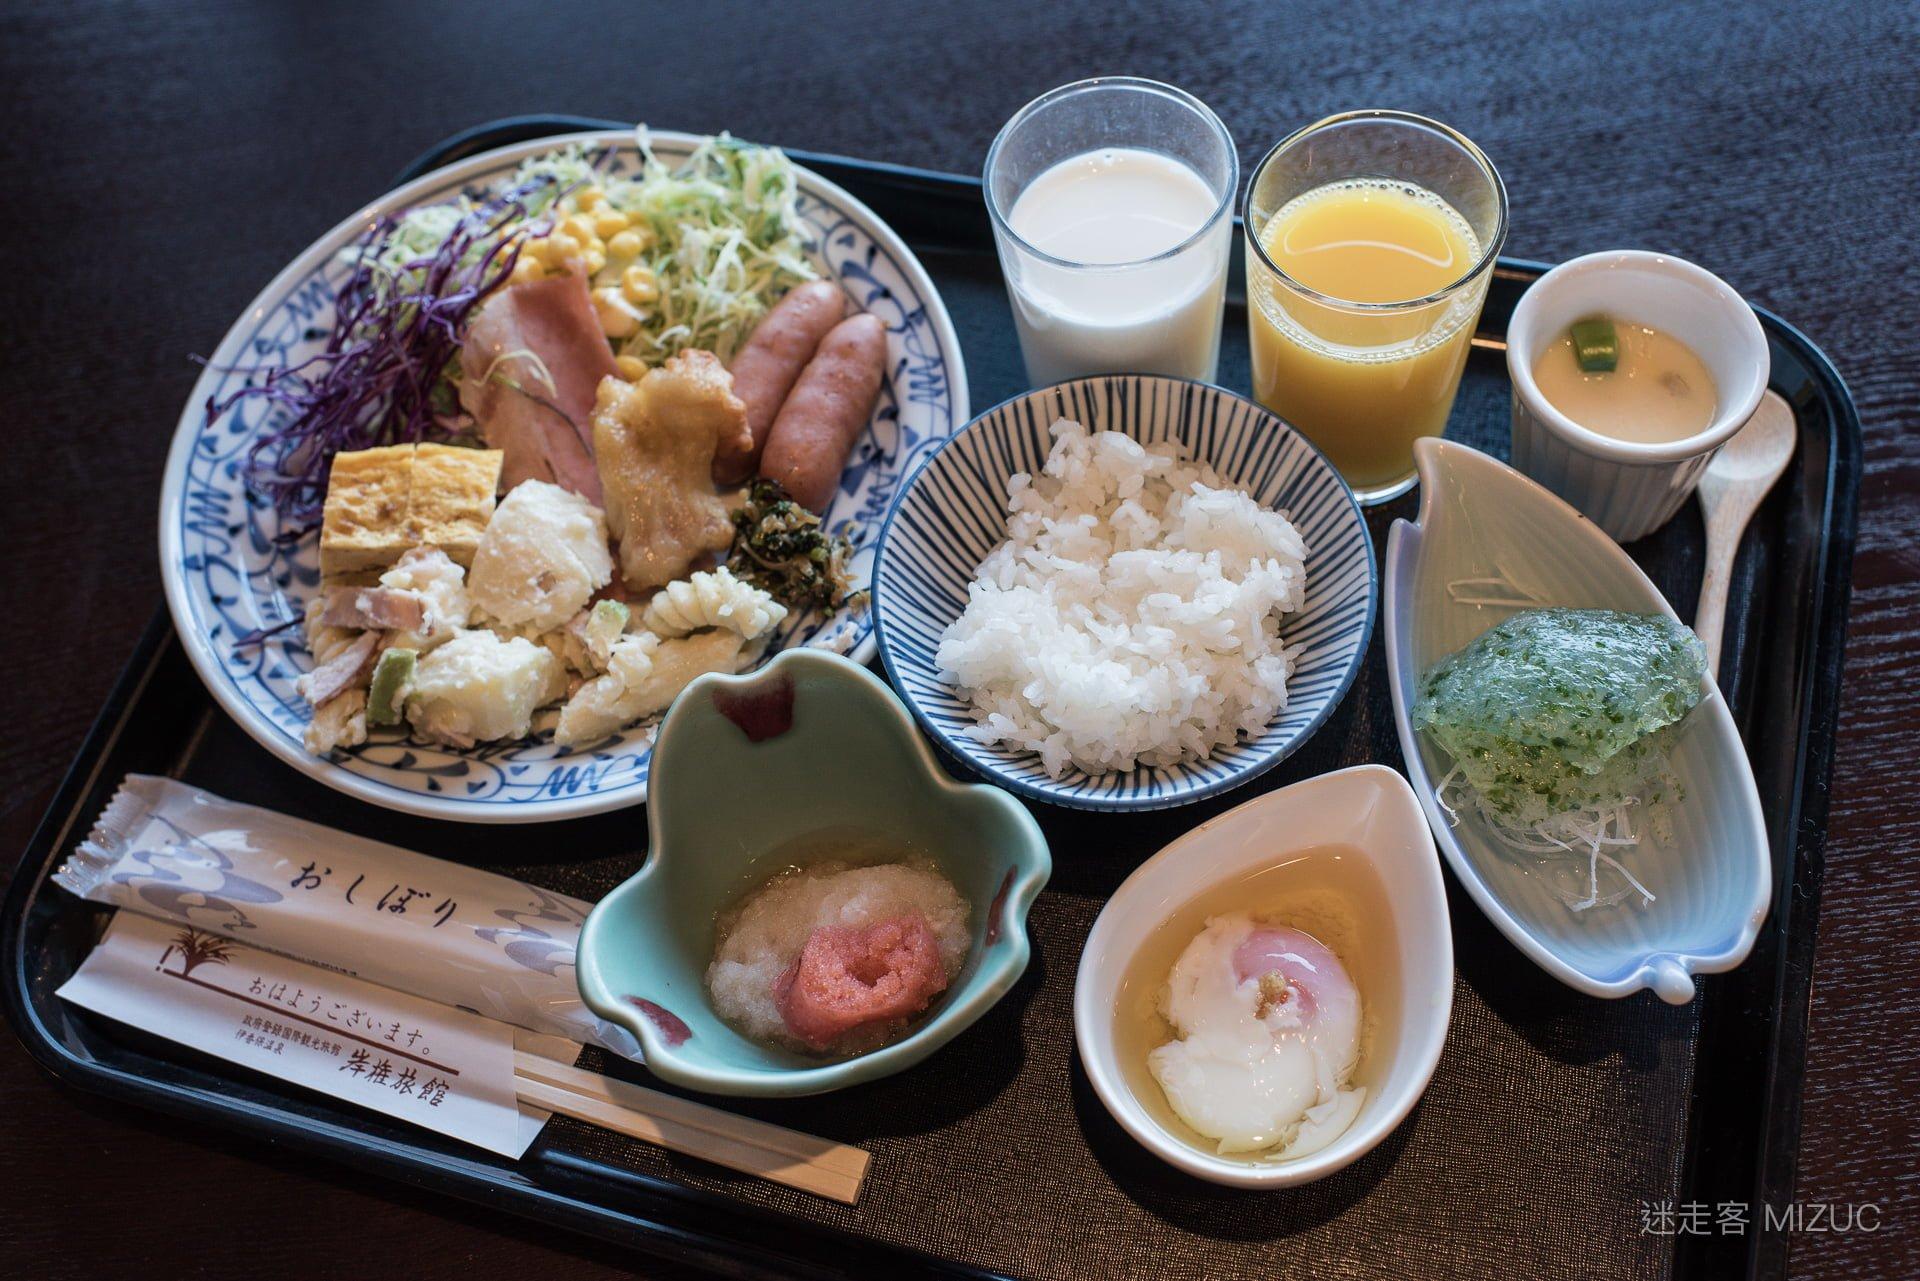 201711 Ibaraki Tochigi Gunma Japan Travel By RentalCar 75 日本自駕旅遊/北關東三縣「茨城、櫪木、群馬」秋天美食、溫泉與瀑布秘境百景(精選照片分享)